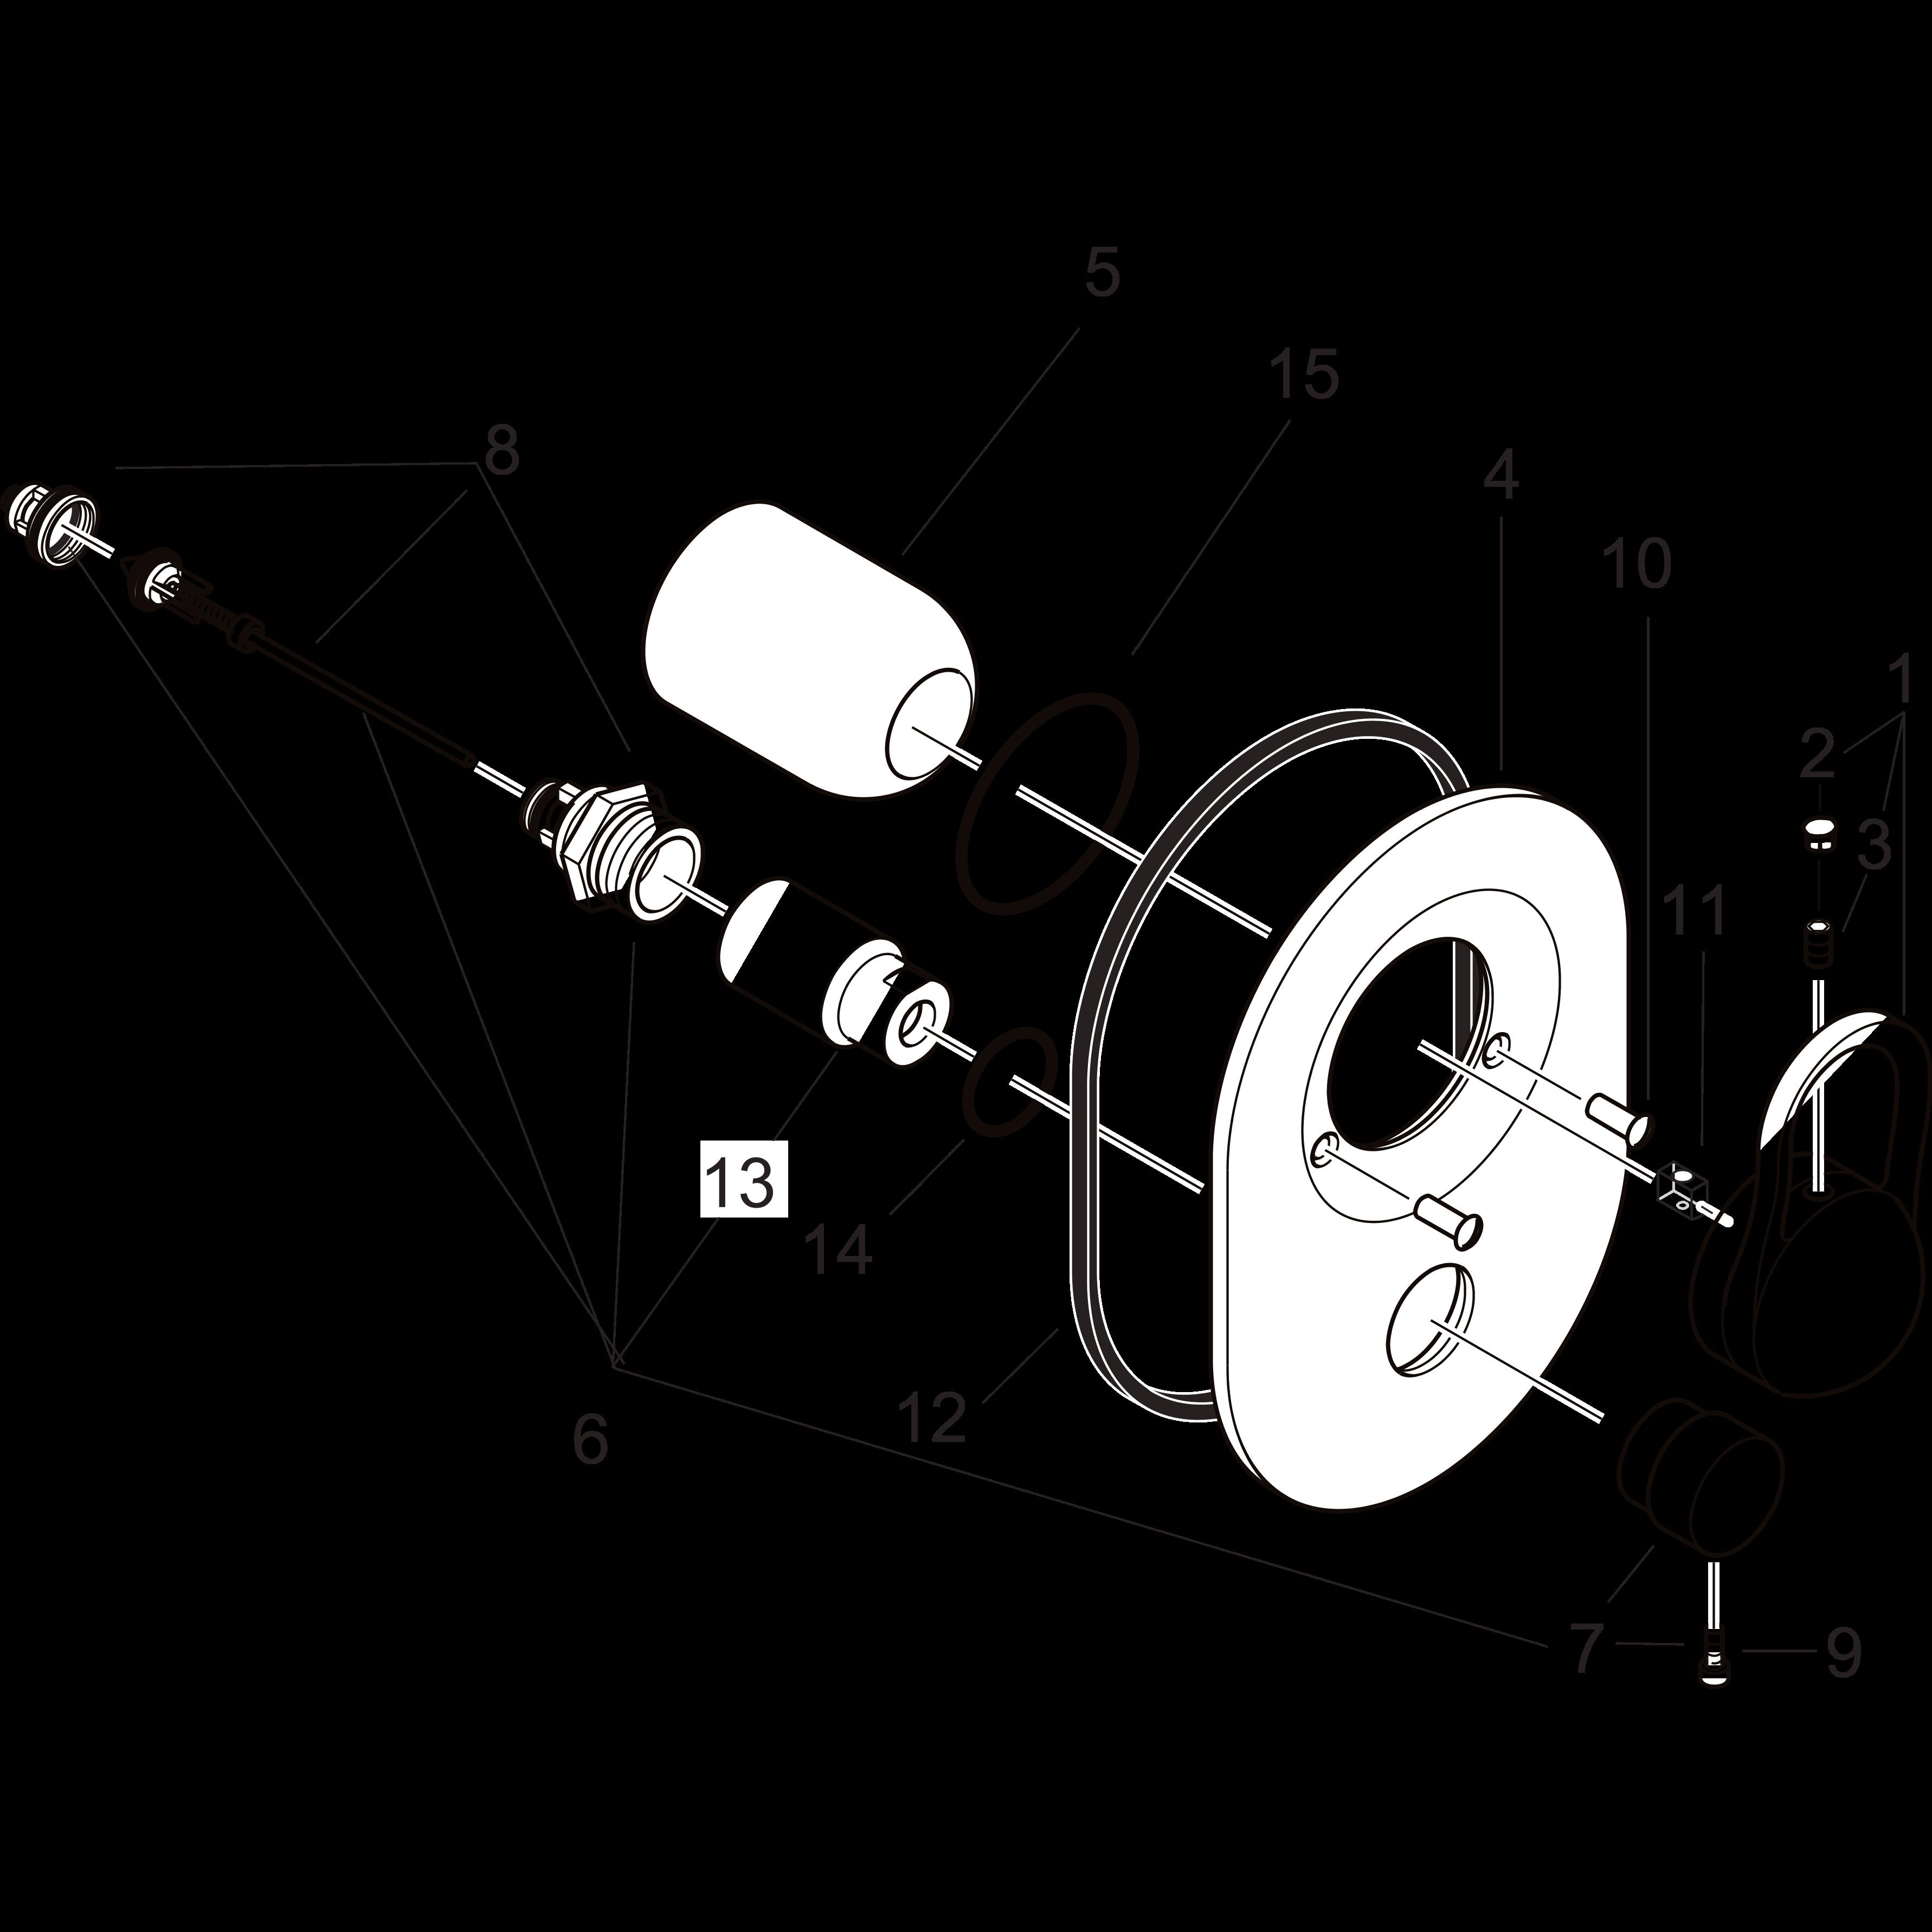 Zubeh/ör 16 St/ück f/ür Arbeitsplattenst/ärke 1-3 Mehrfarbig 5 cm hansgrohe K/üchensp/üle Spannelemente-Set